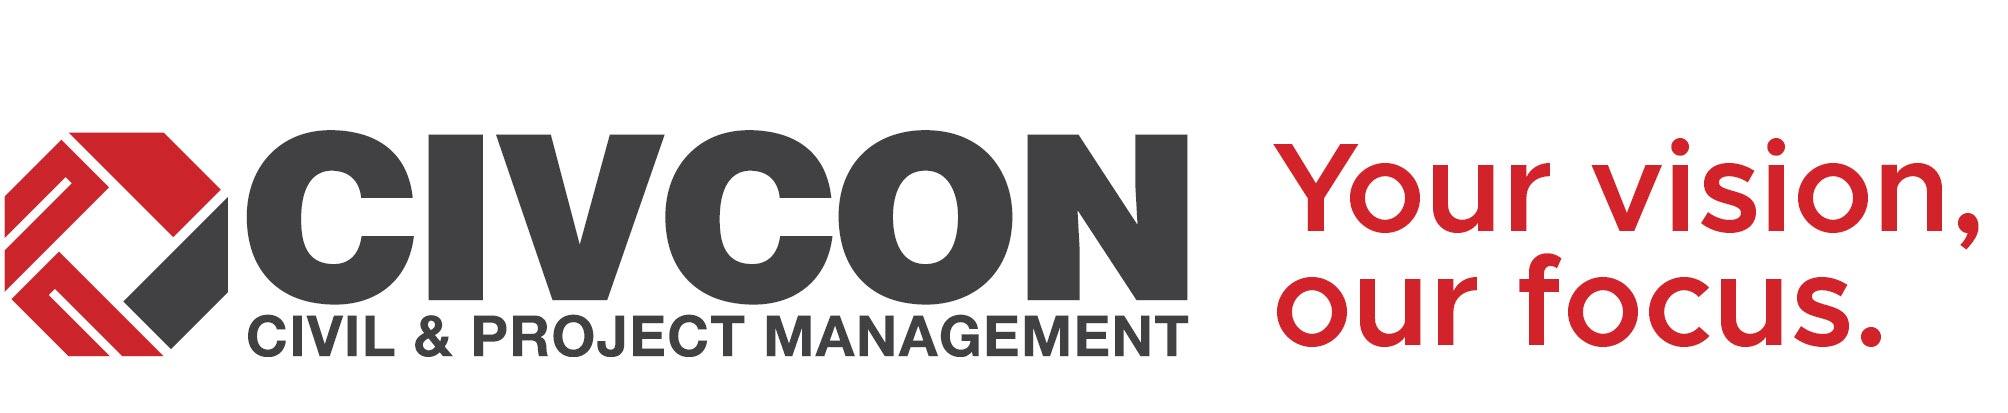 Civcon Vision - Email.jpg